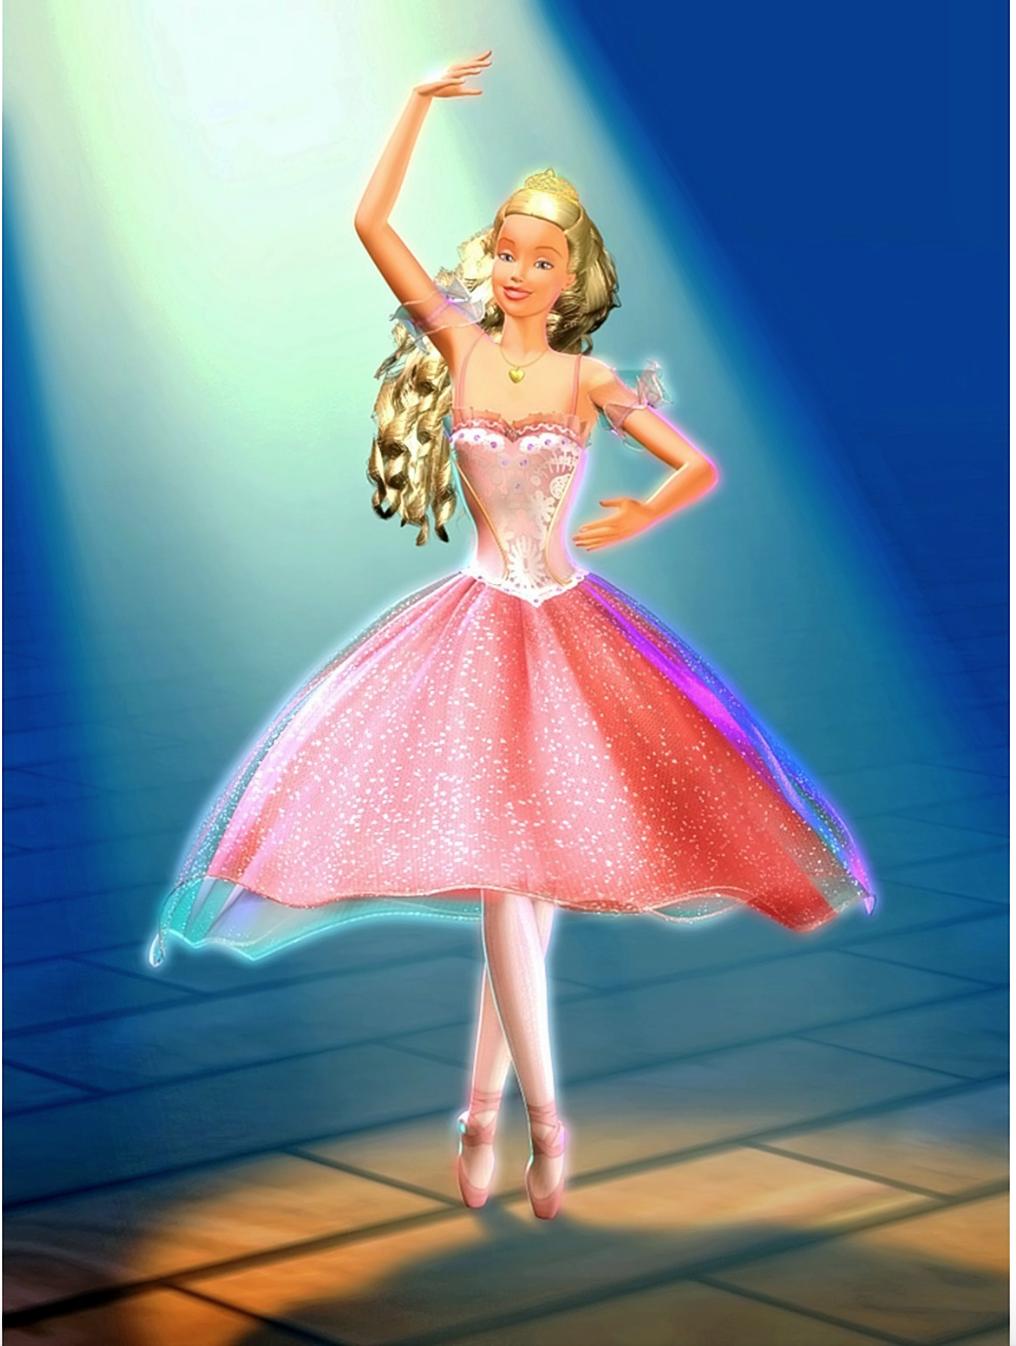 Clara As The Sugar Plum Princess From Barbie In The Nutcracker